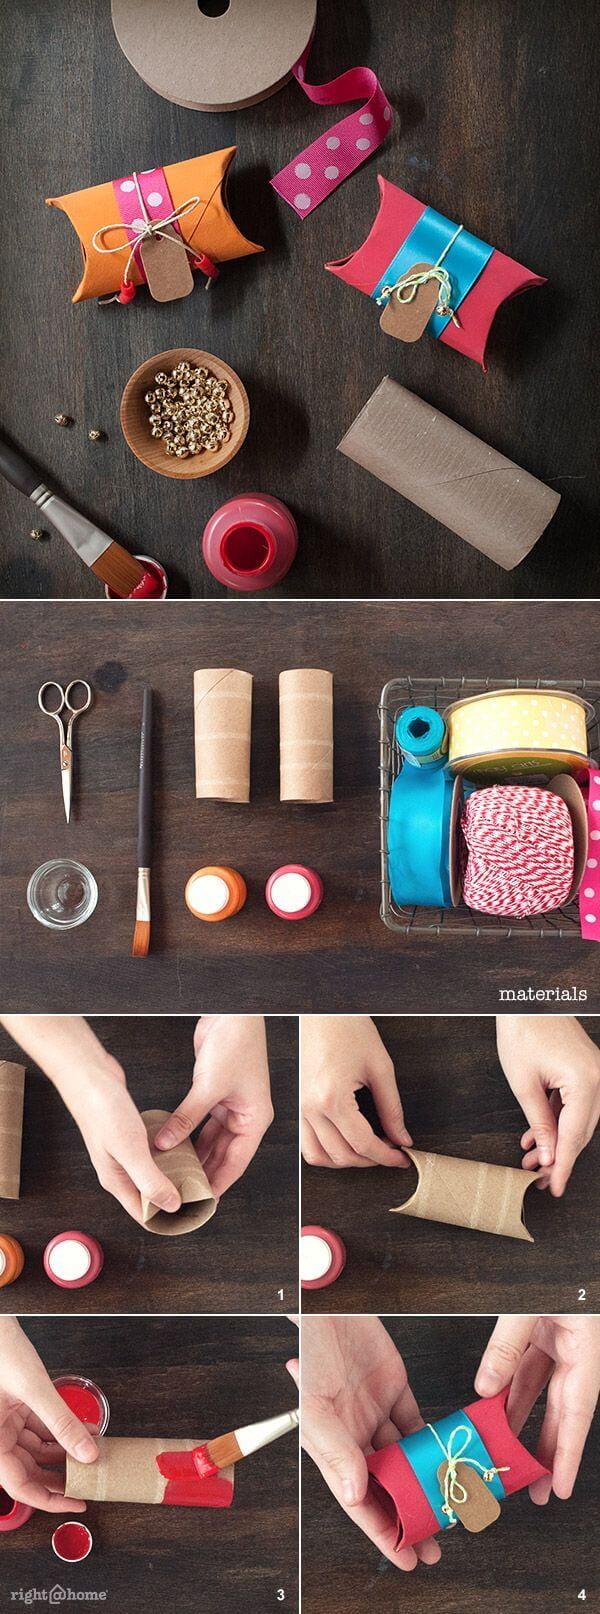 hediye Kutusu Hazırlama-4